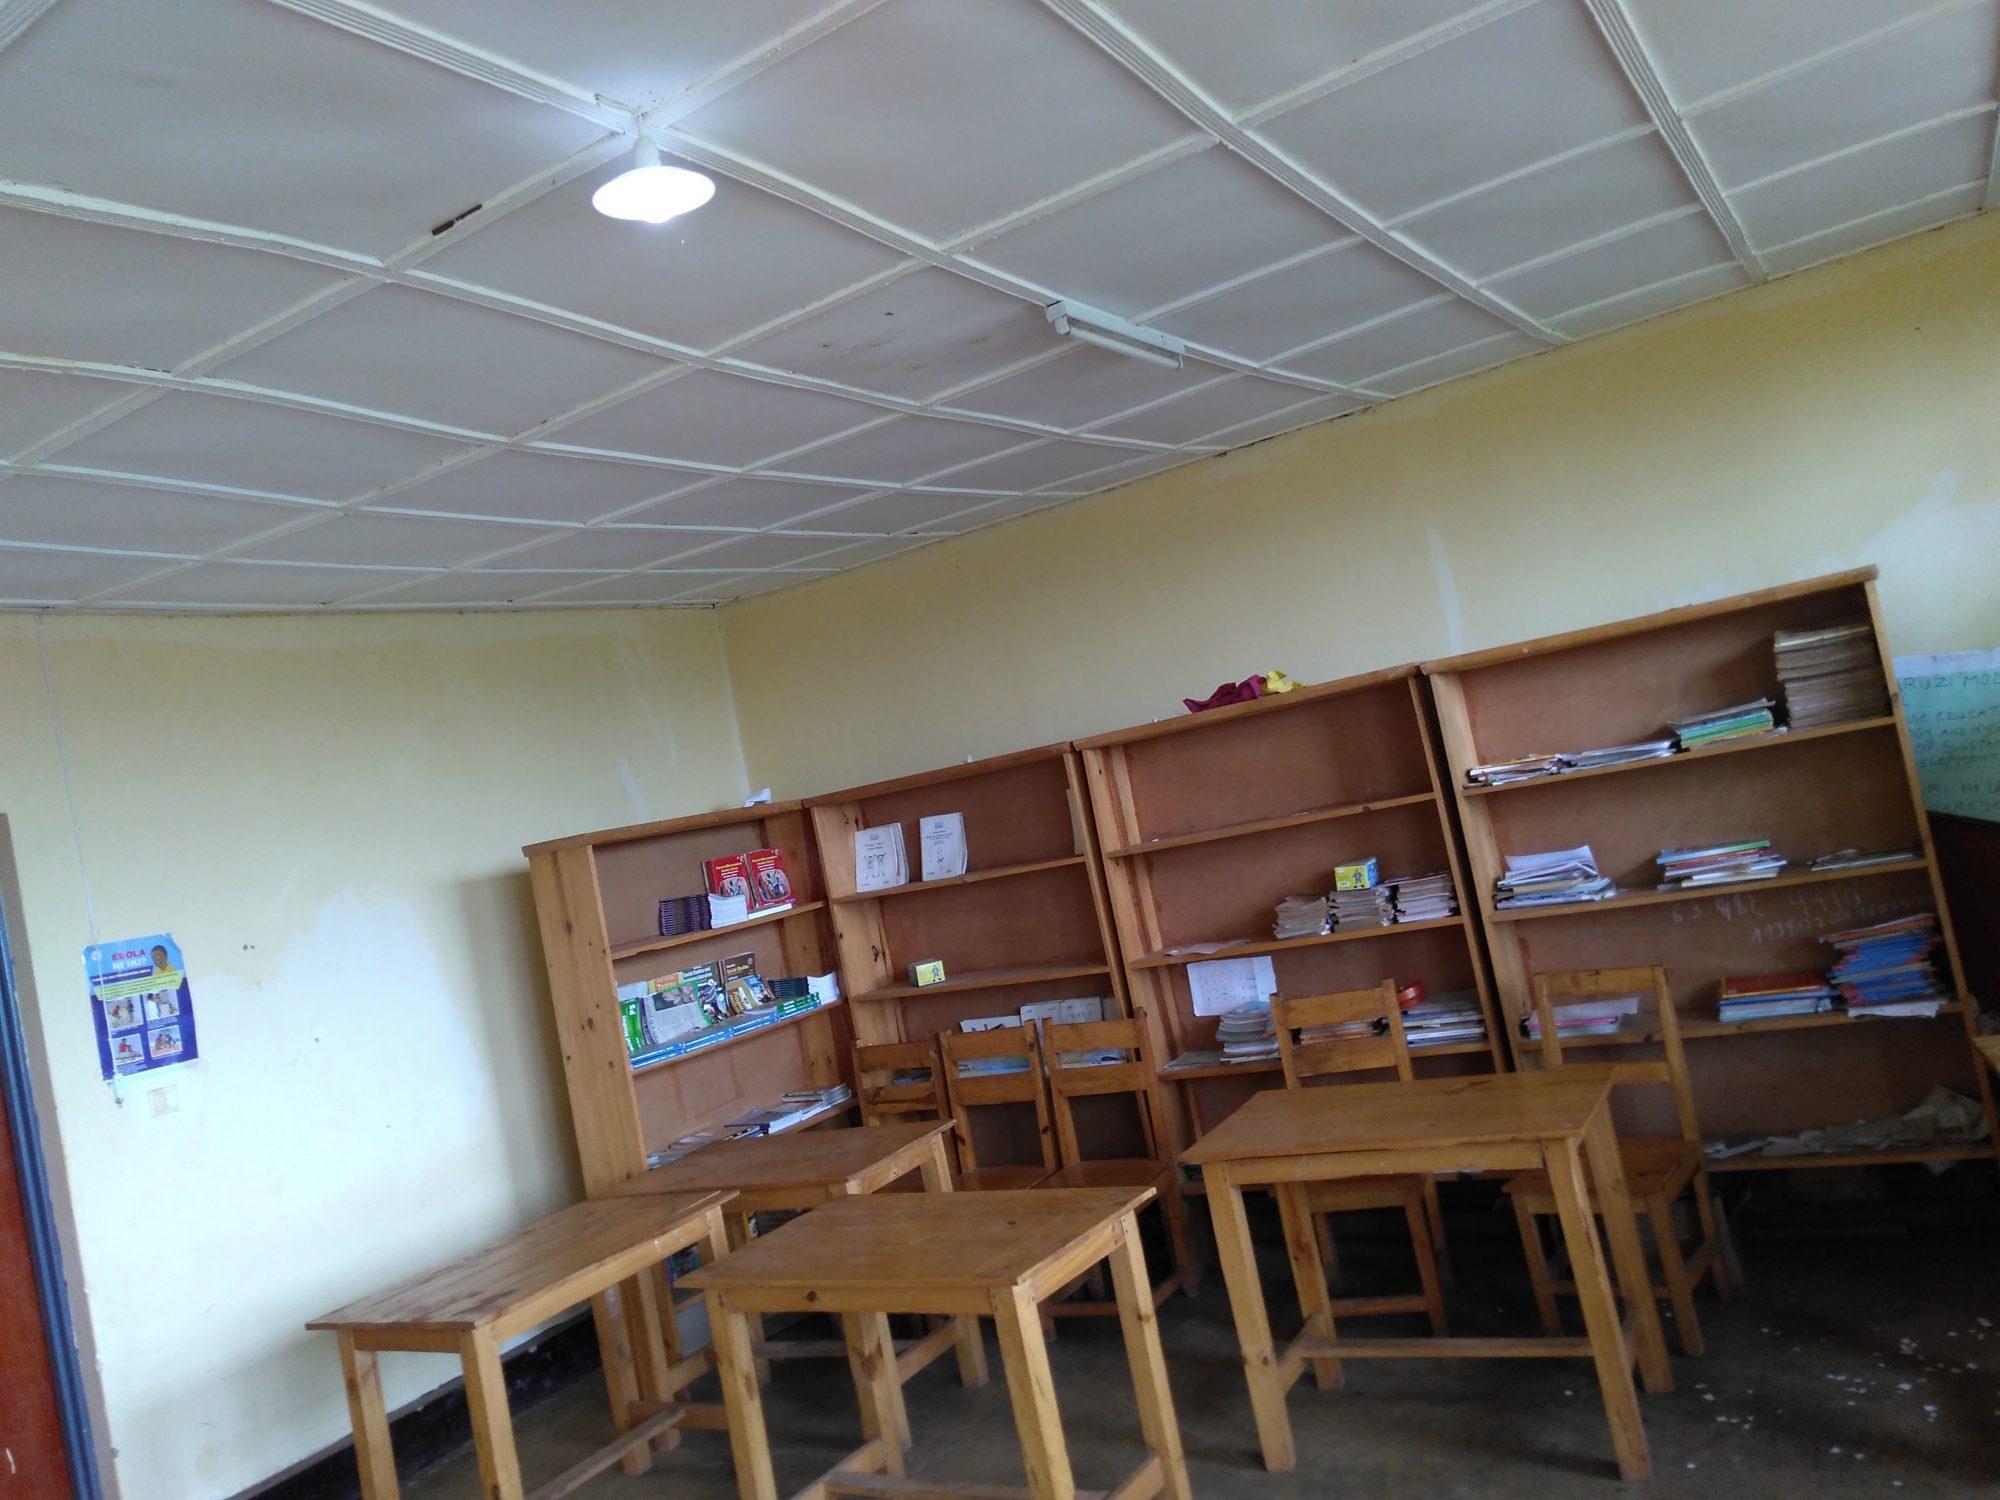 Light in classroom